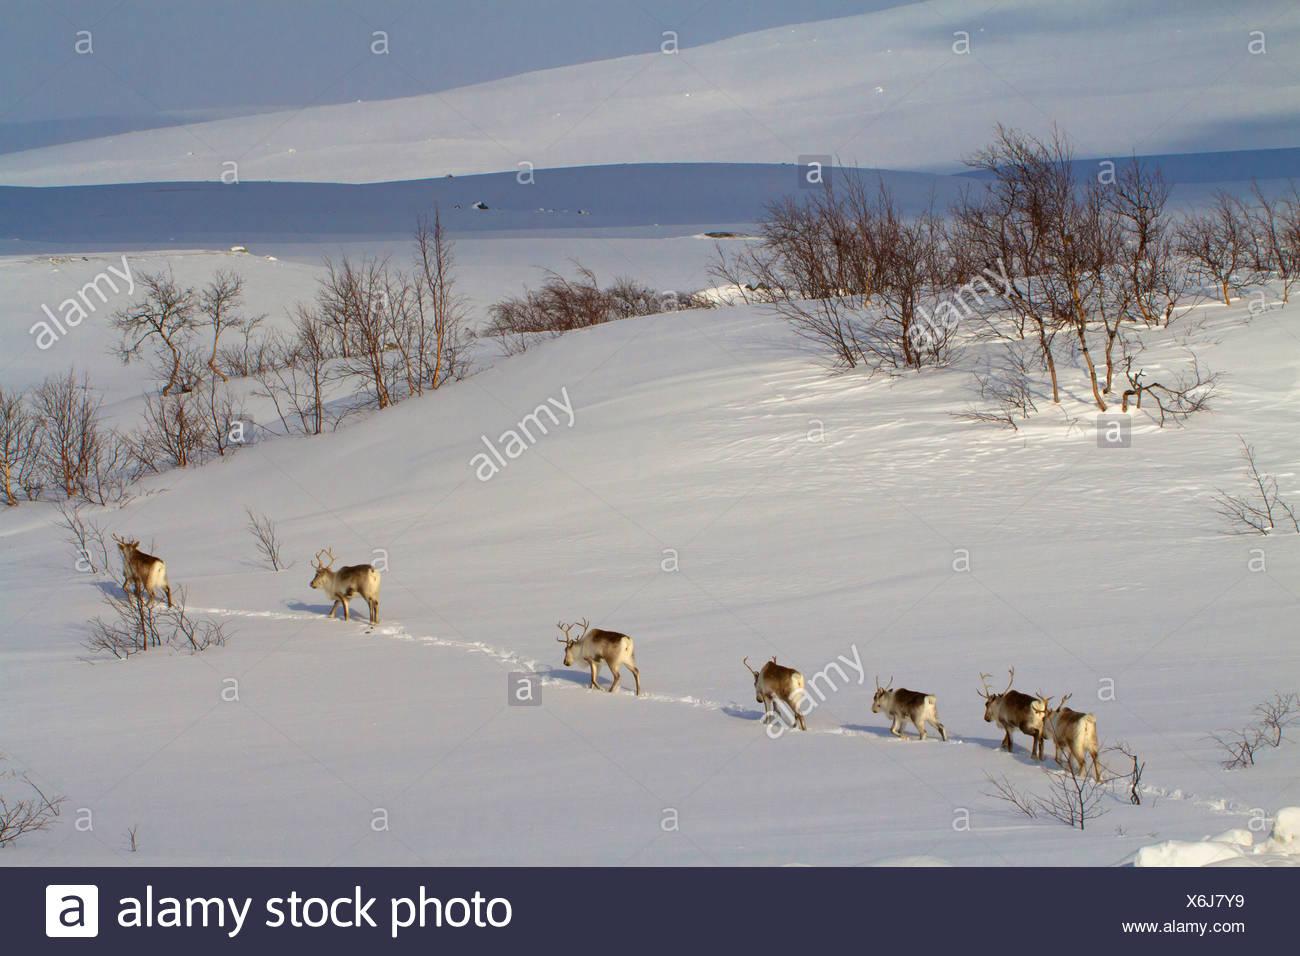 reindeer, caribou (Rangifer tarandus), herd walking one behind another in snowy landscape, Norway, Nordland, Saltfjell Stock Photo